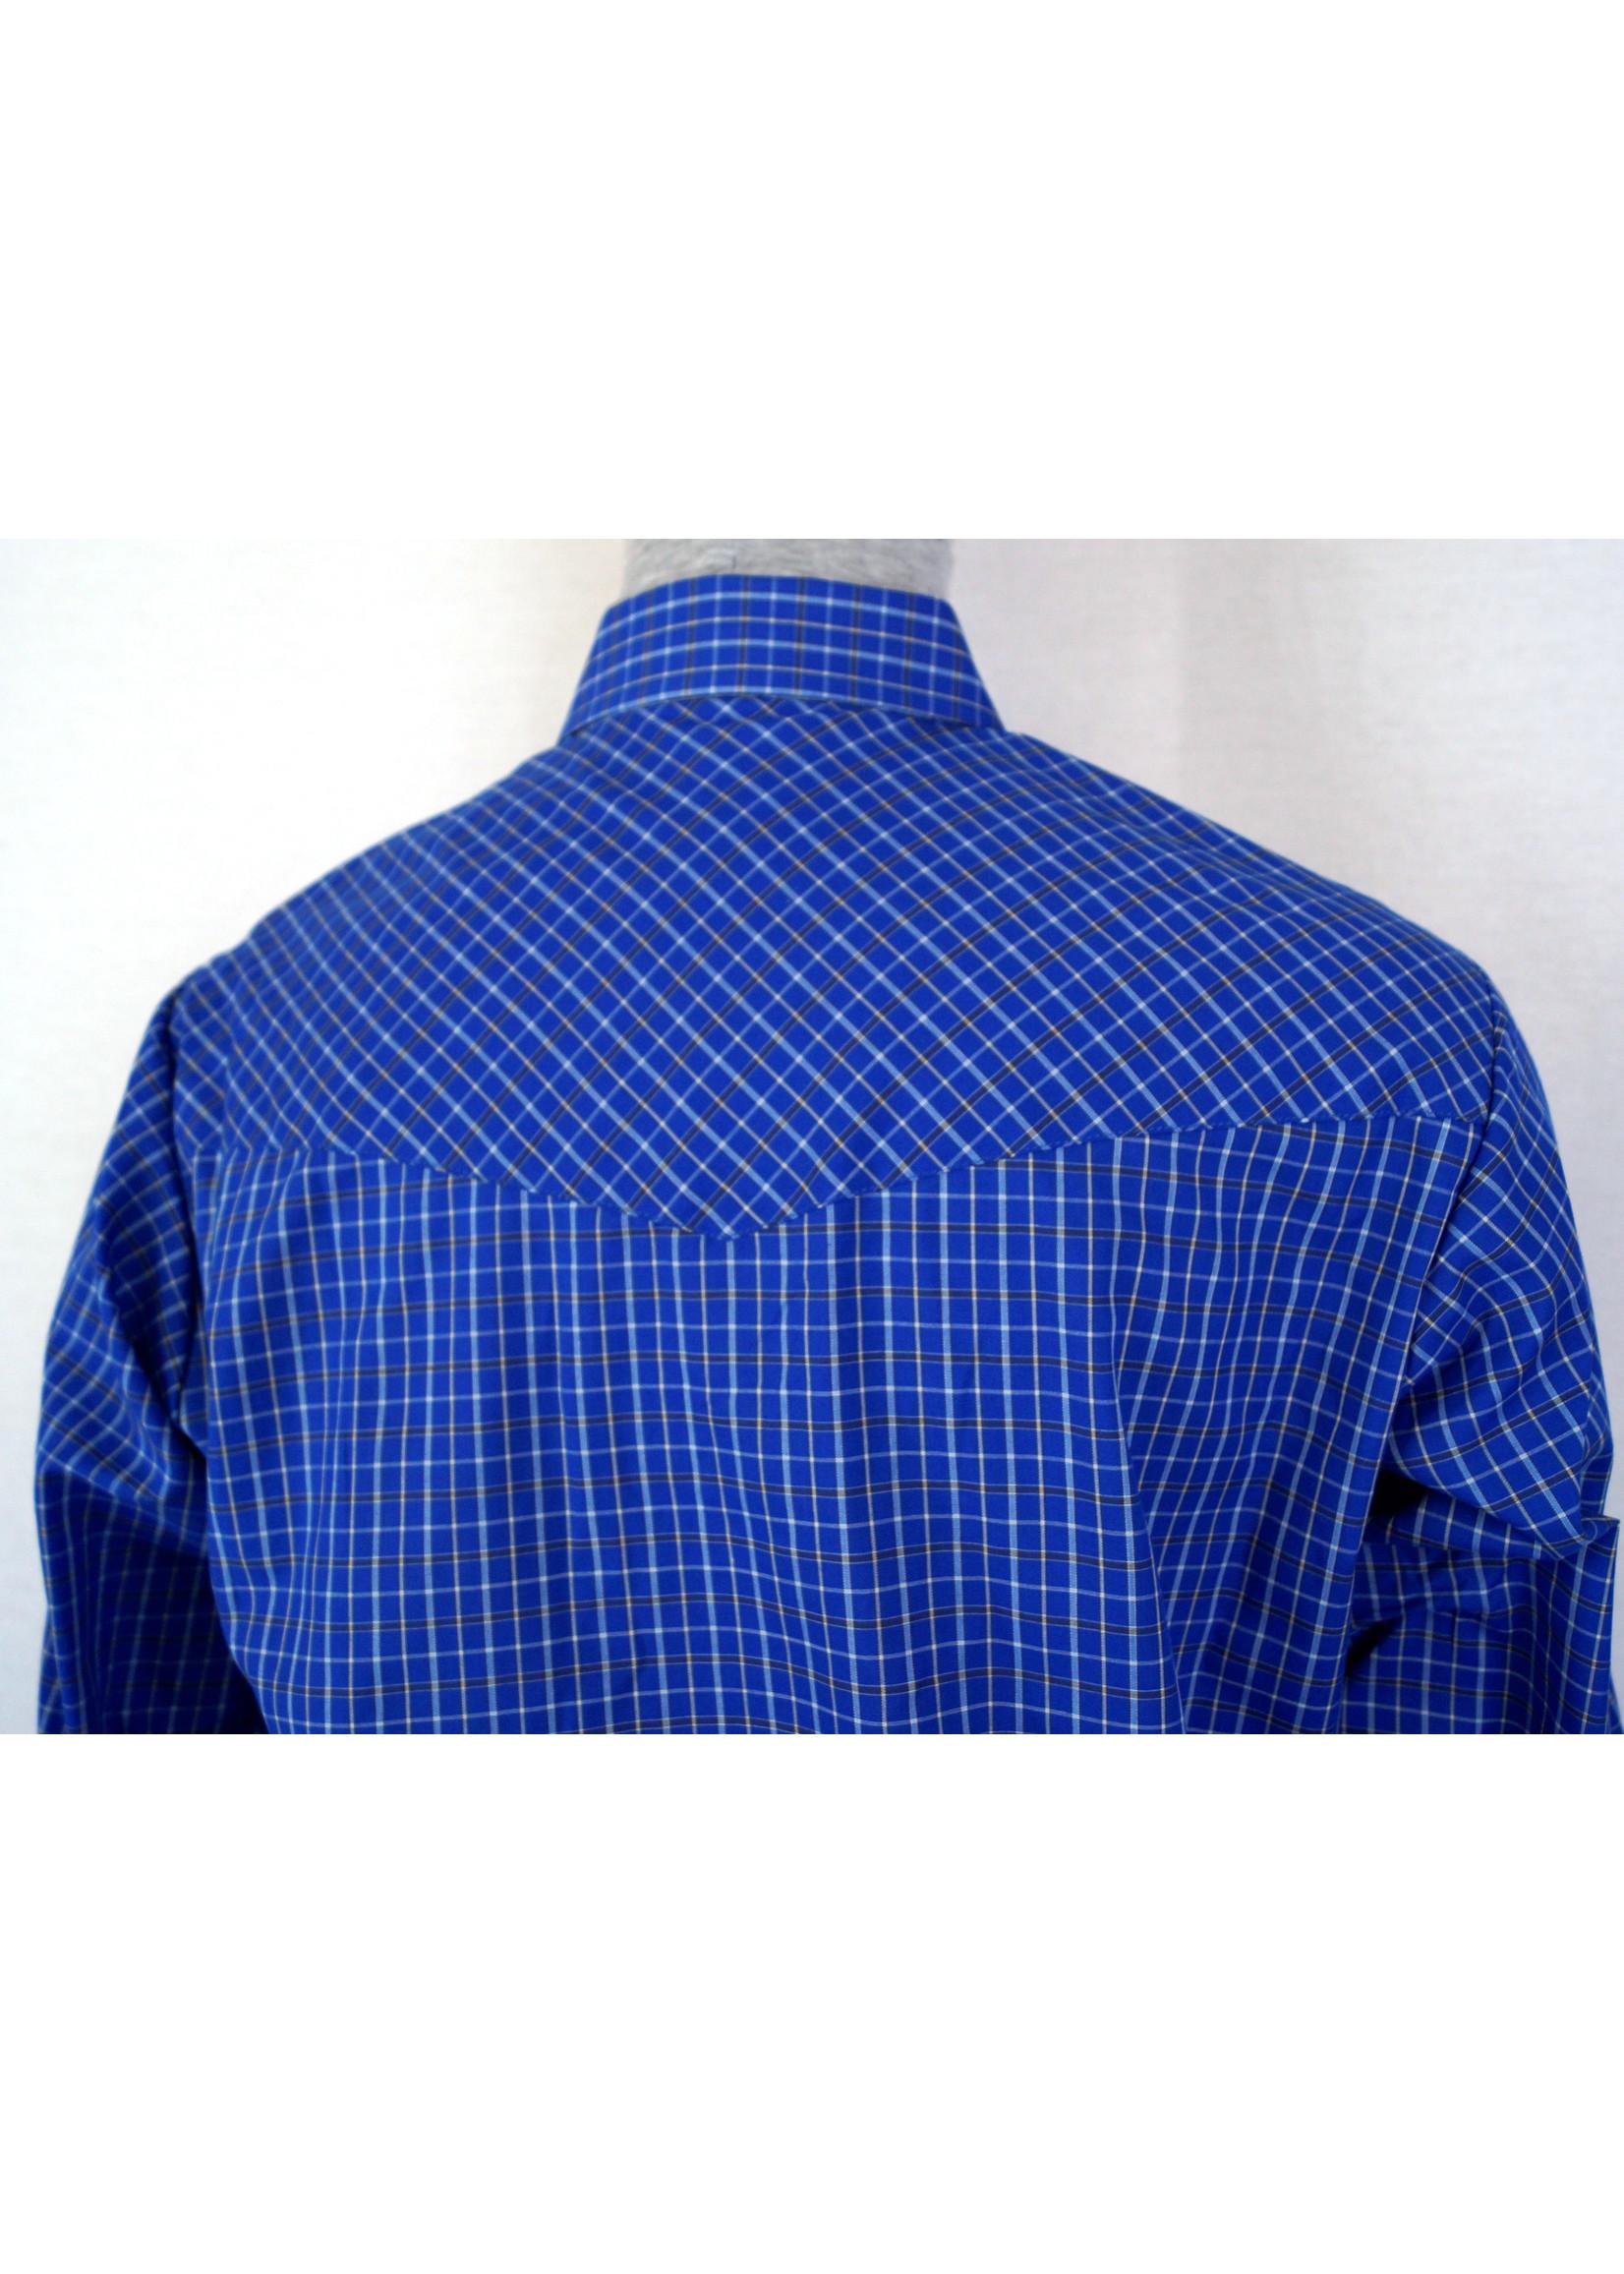 Ely Men's Long Sleeve Blue Checkered Shirt